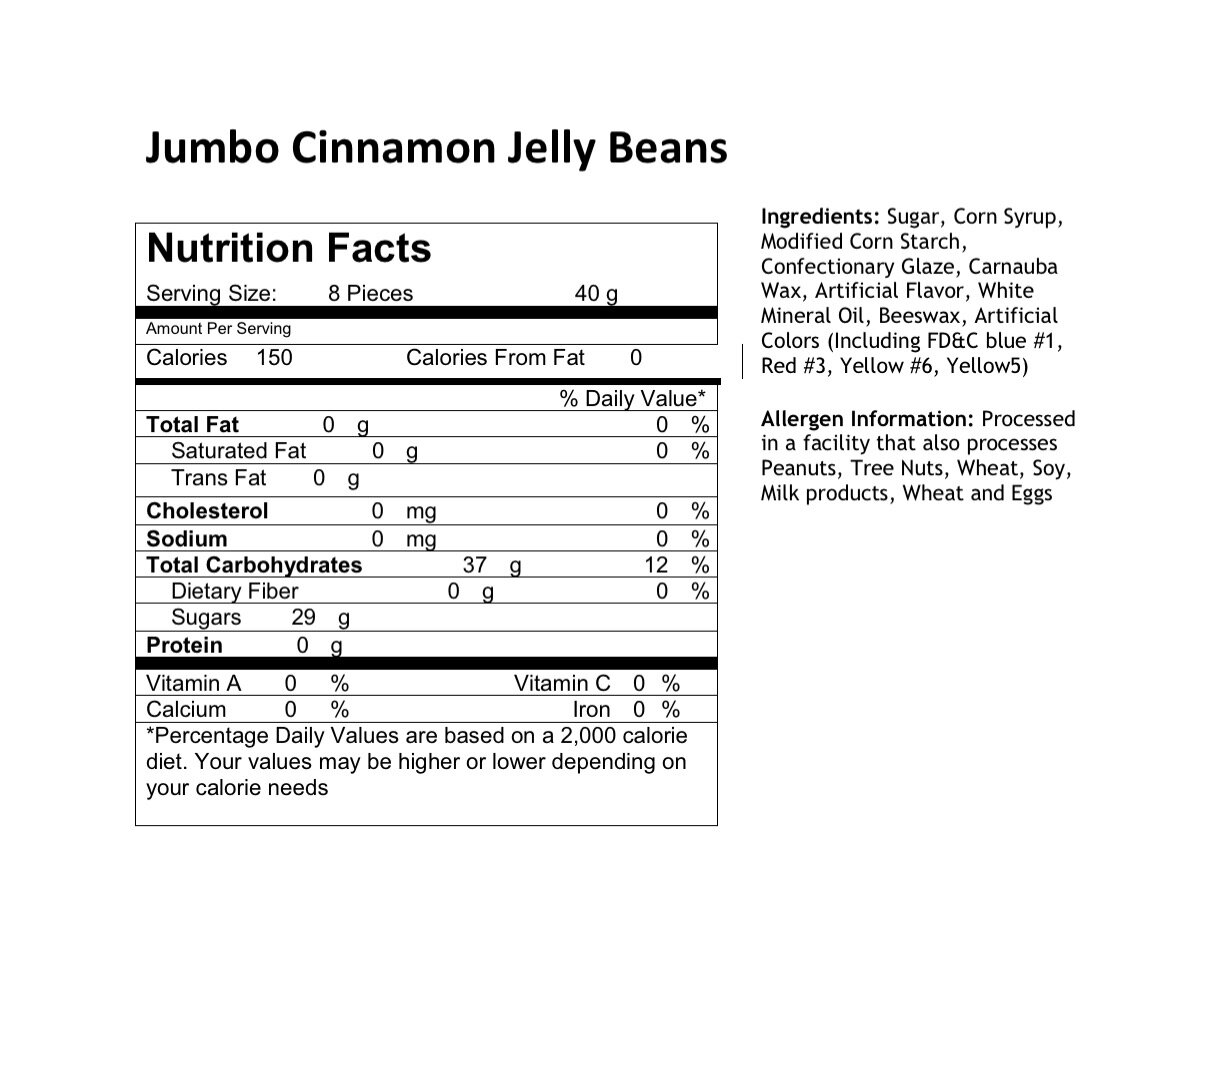 Jumbo Cinnamon Ingredient